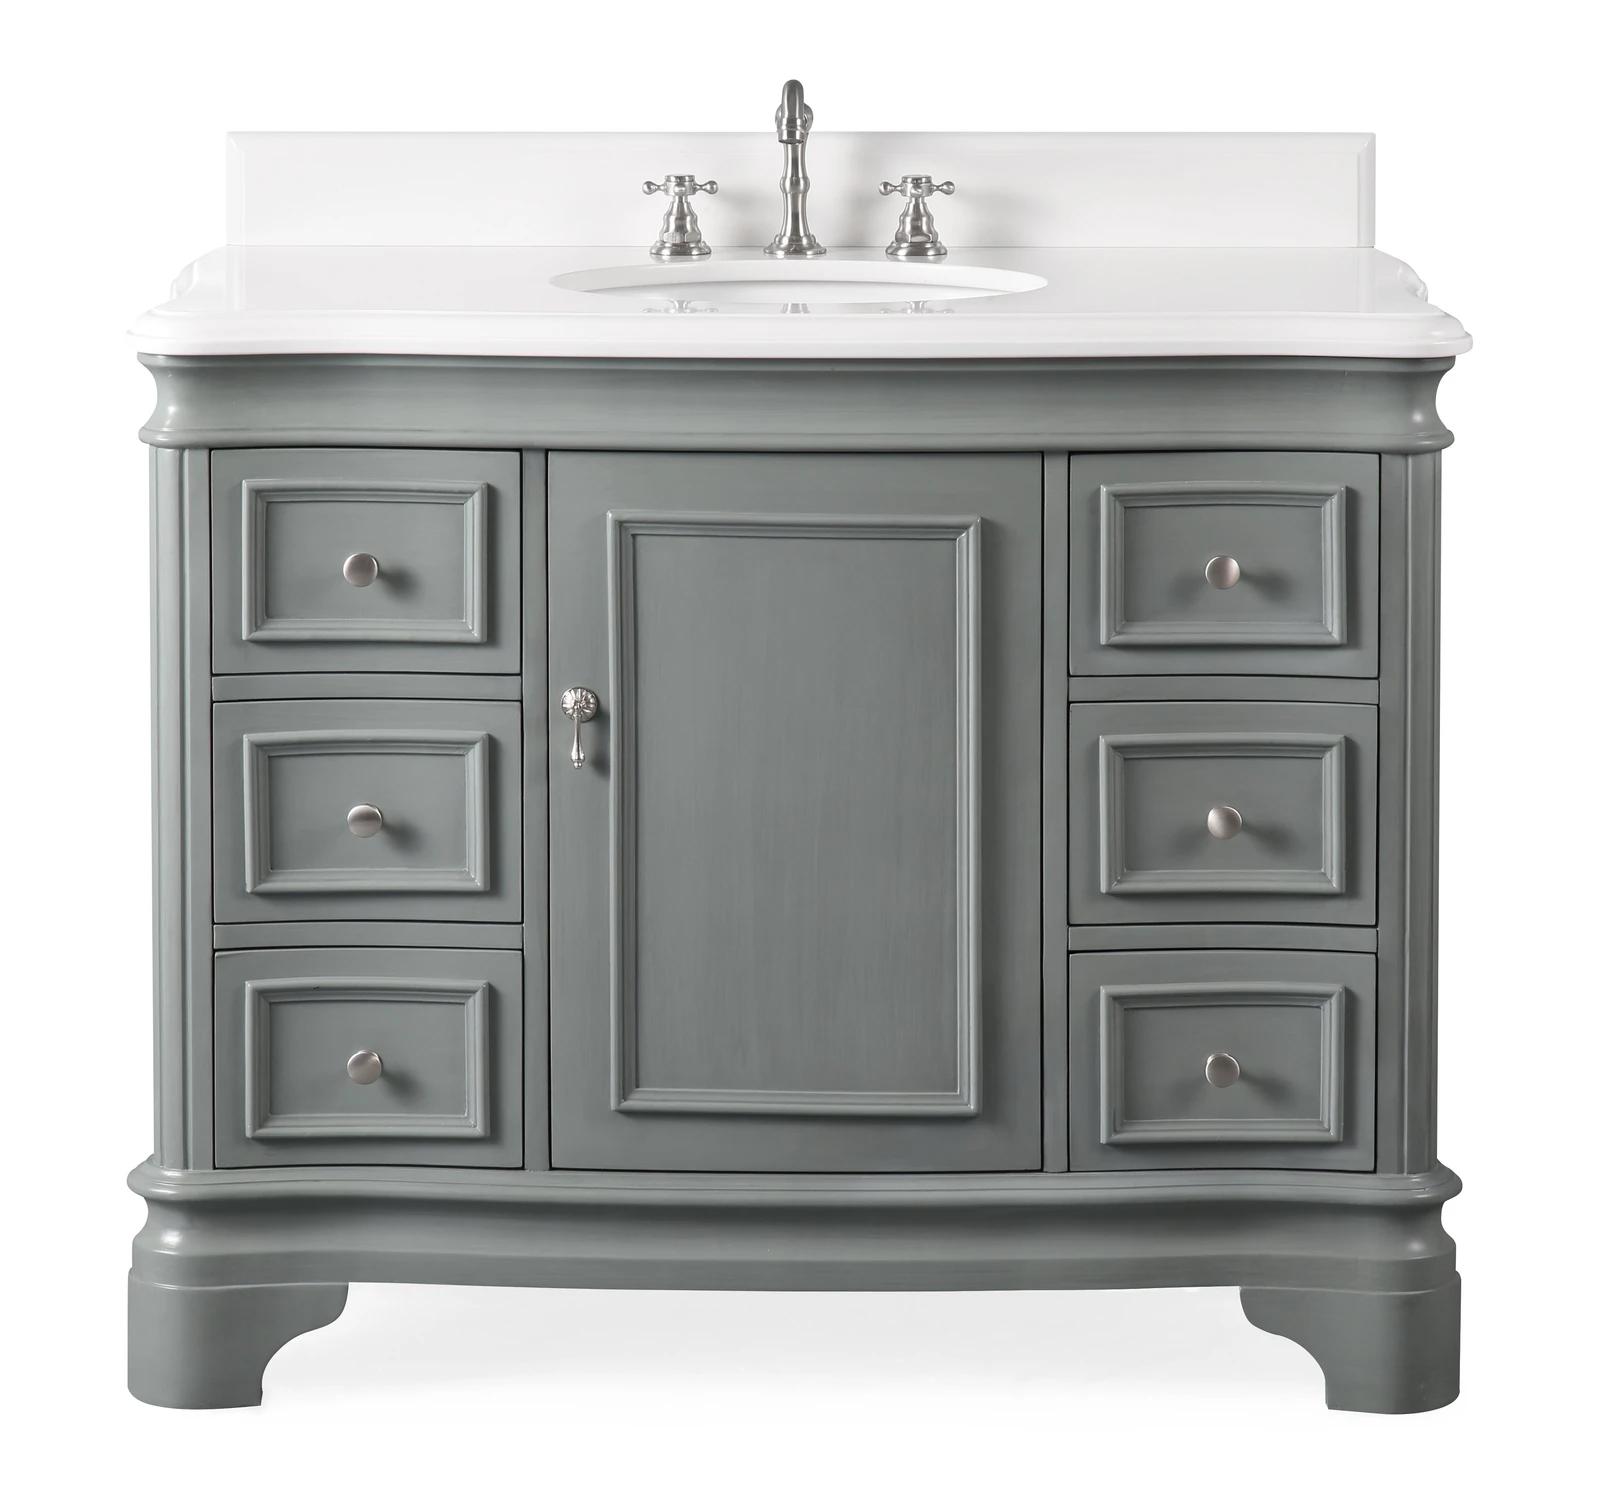 "42"" Modern Style Grey Bathroom Vanity Sink with White Quartz Counter Top"